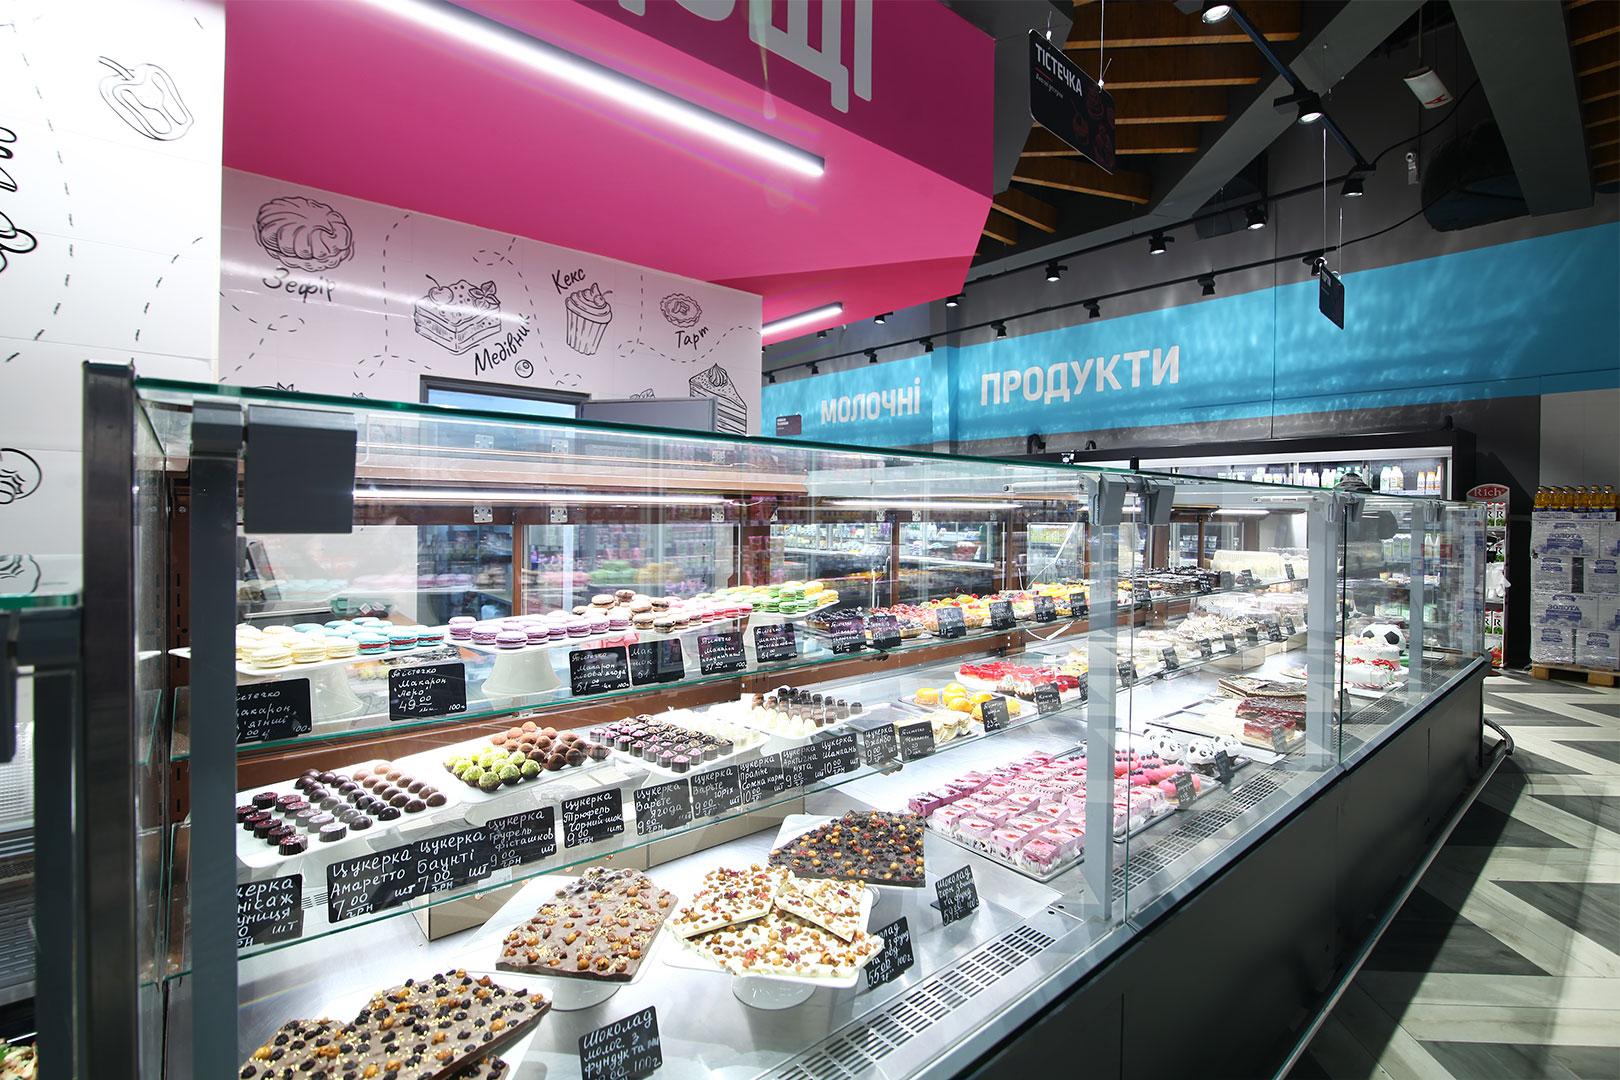 Confectionery counters Missouri MC 120 patisserie PS 130-DLM